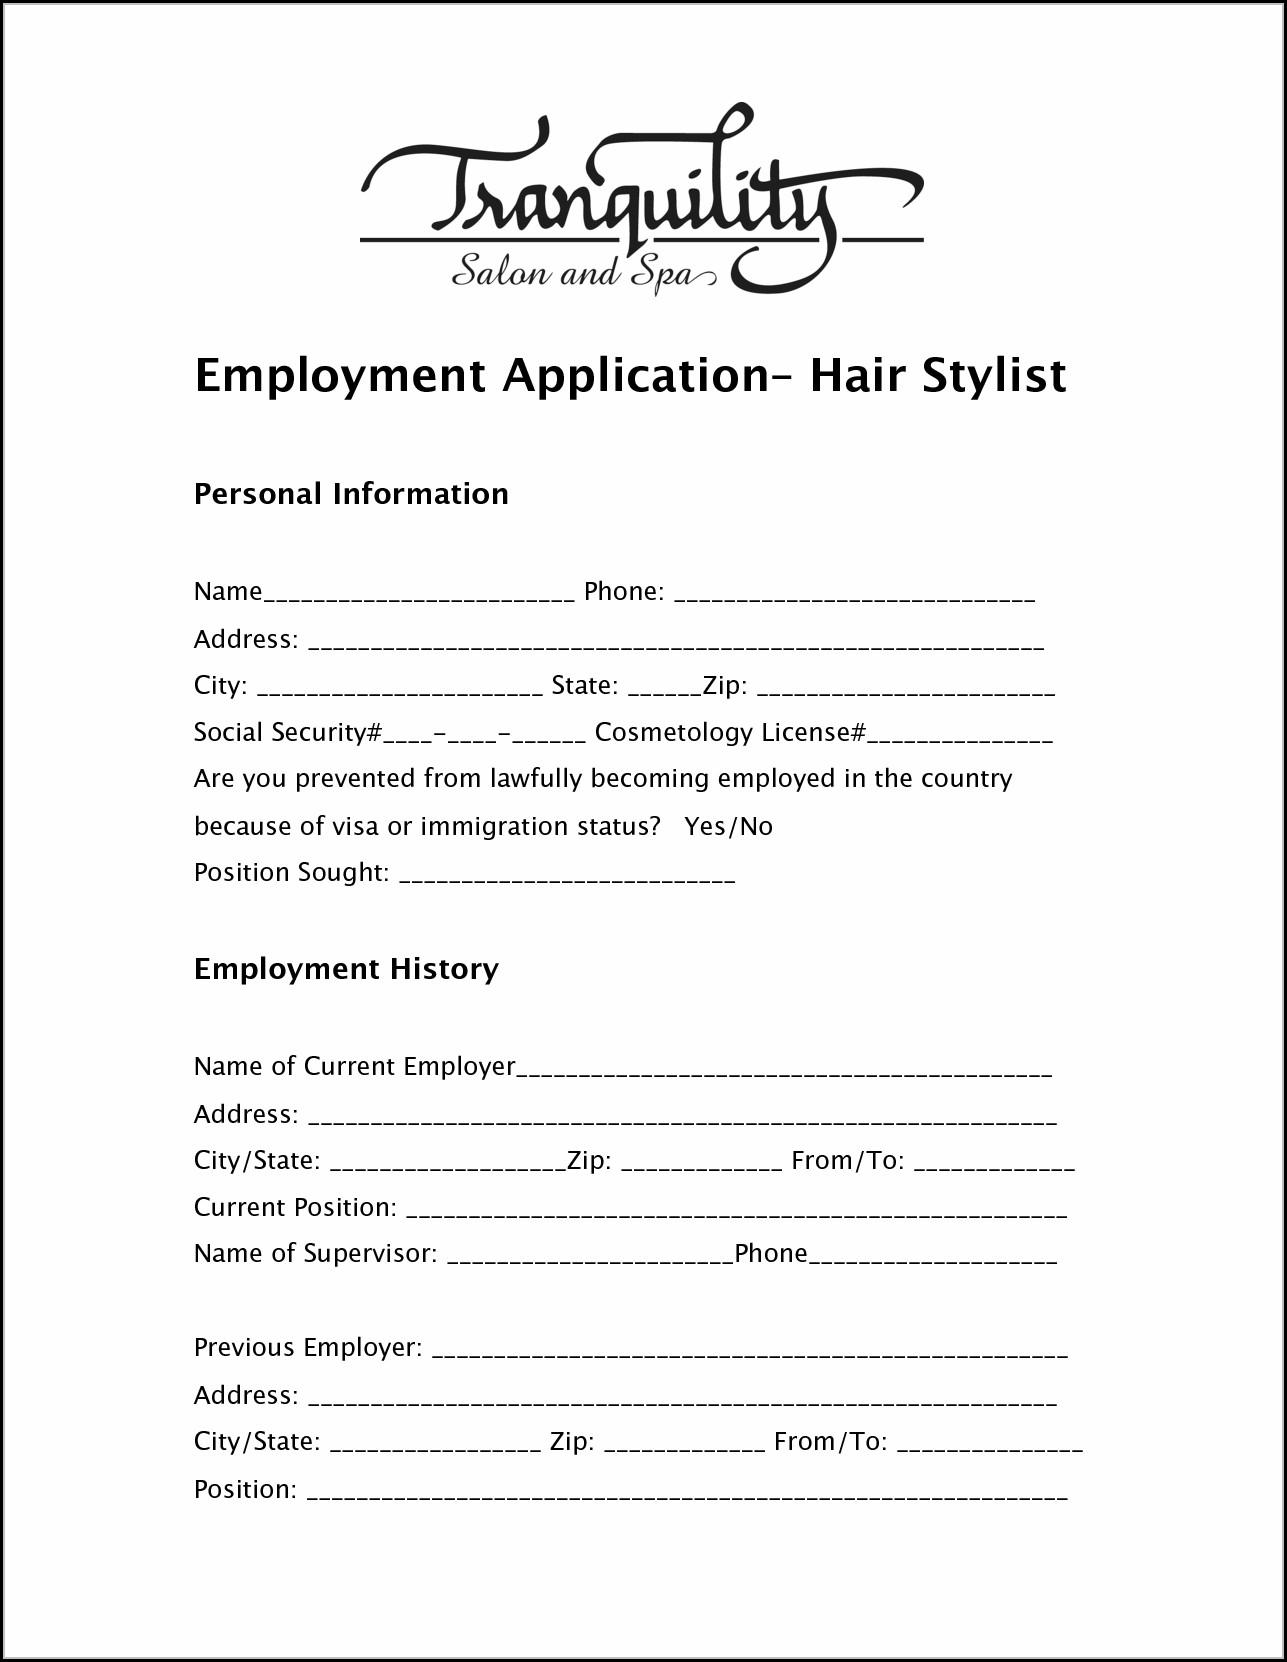 salon-job-application Salon Job Application Forms on printable restaurant, basic blank, dunkin donuts, clip art, new york, foot locker,